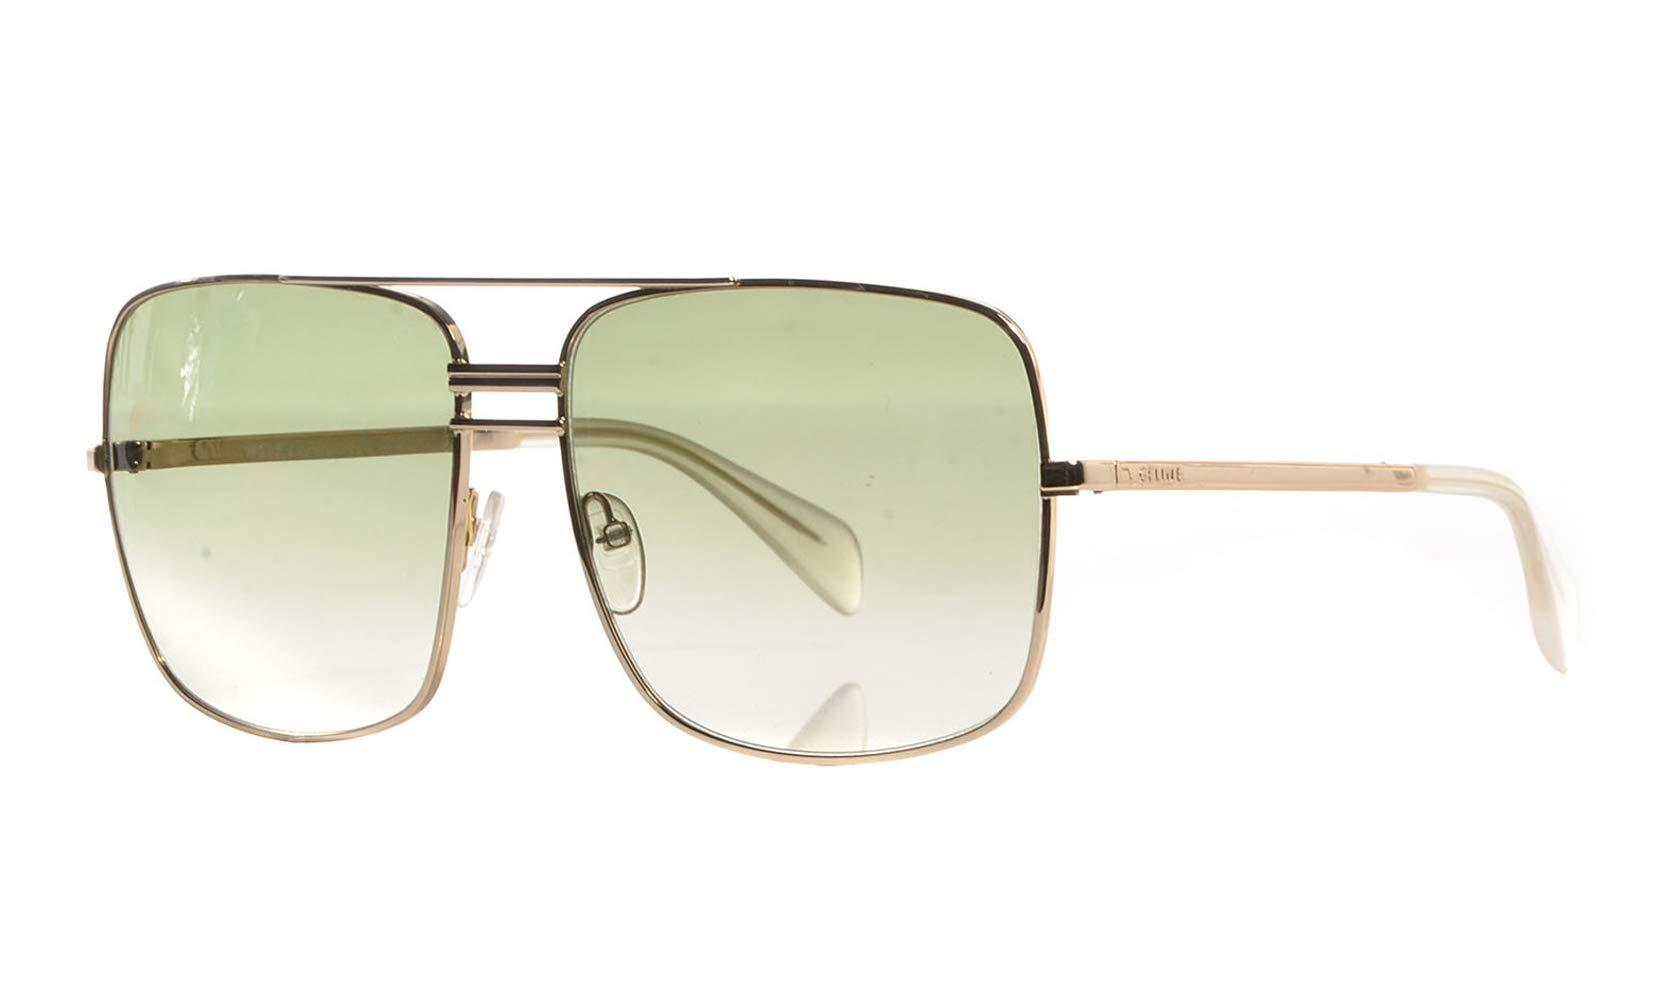 Céline Sunglasses - 41808/S / Frame: Gold Lens: Smoke Flash Silver